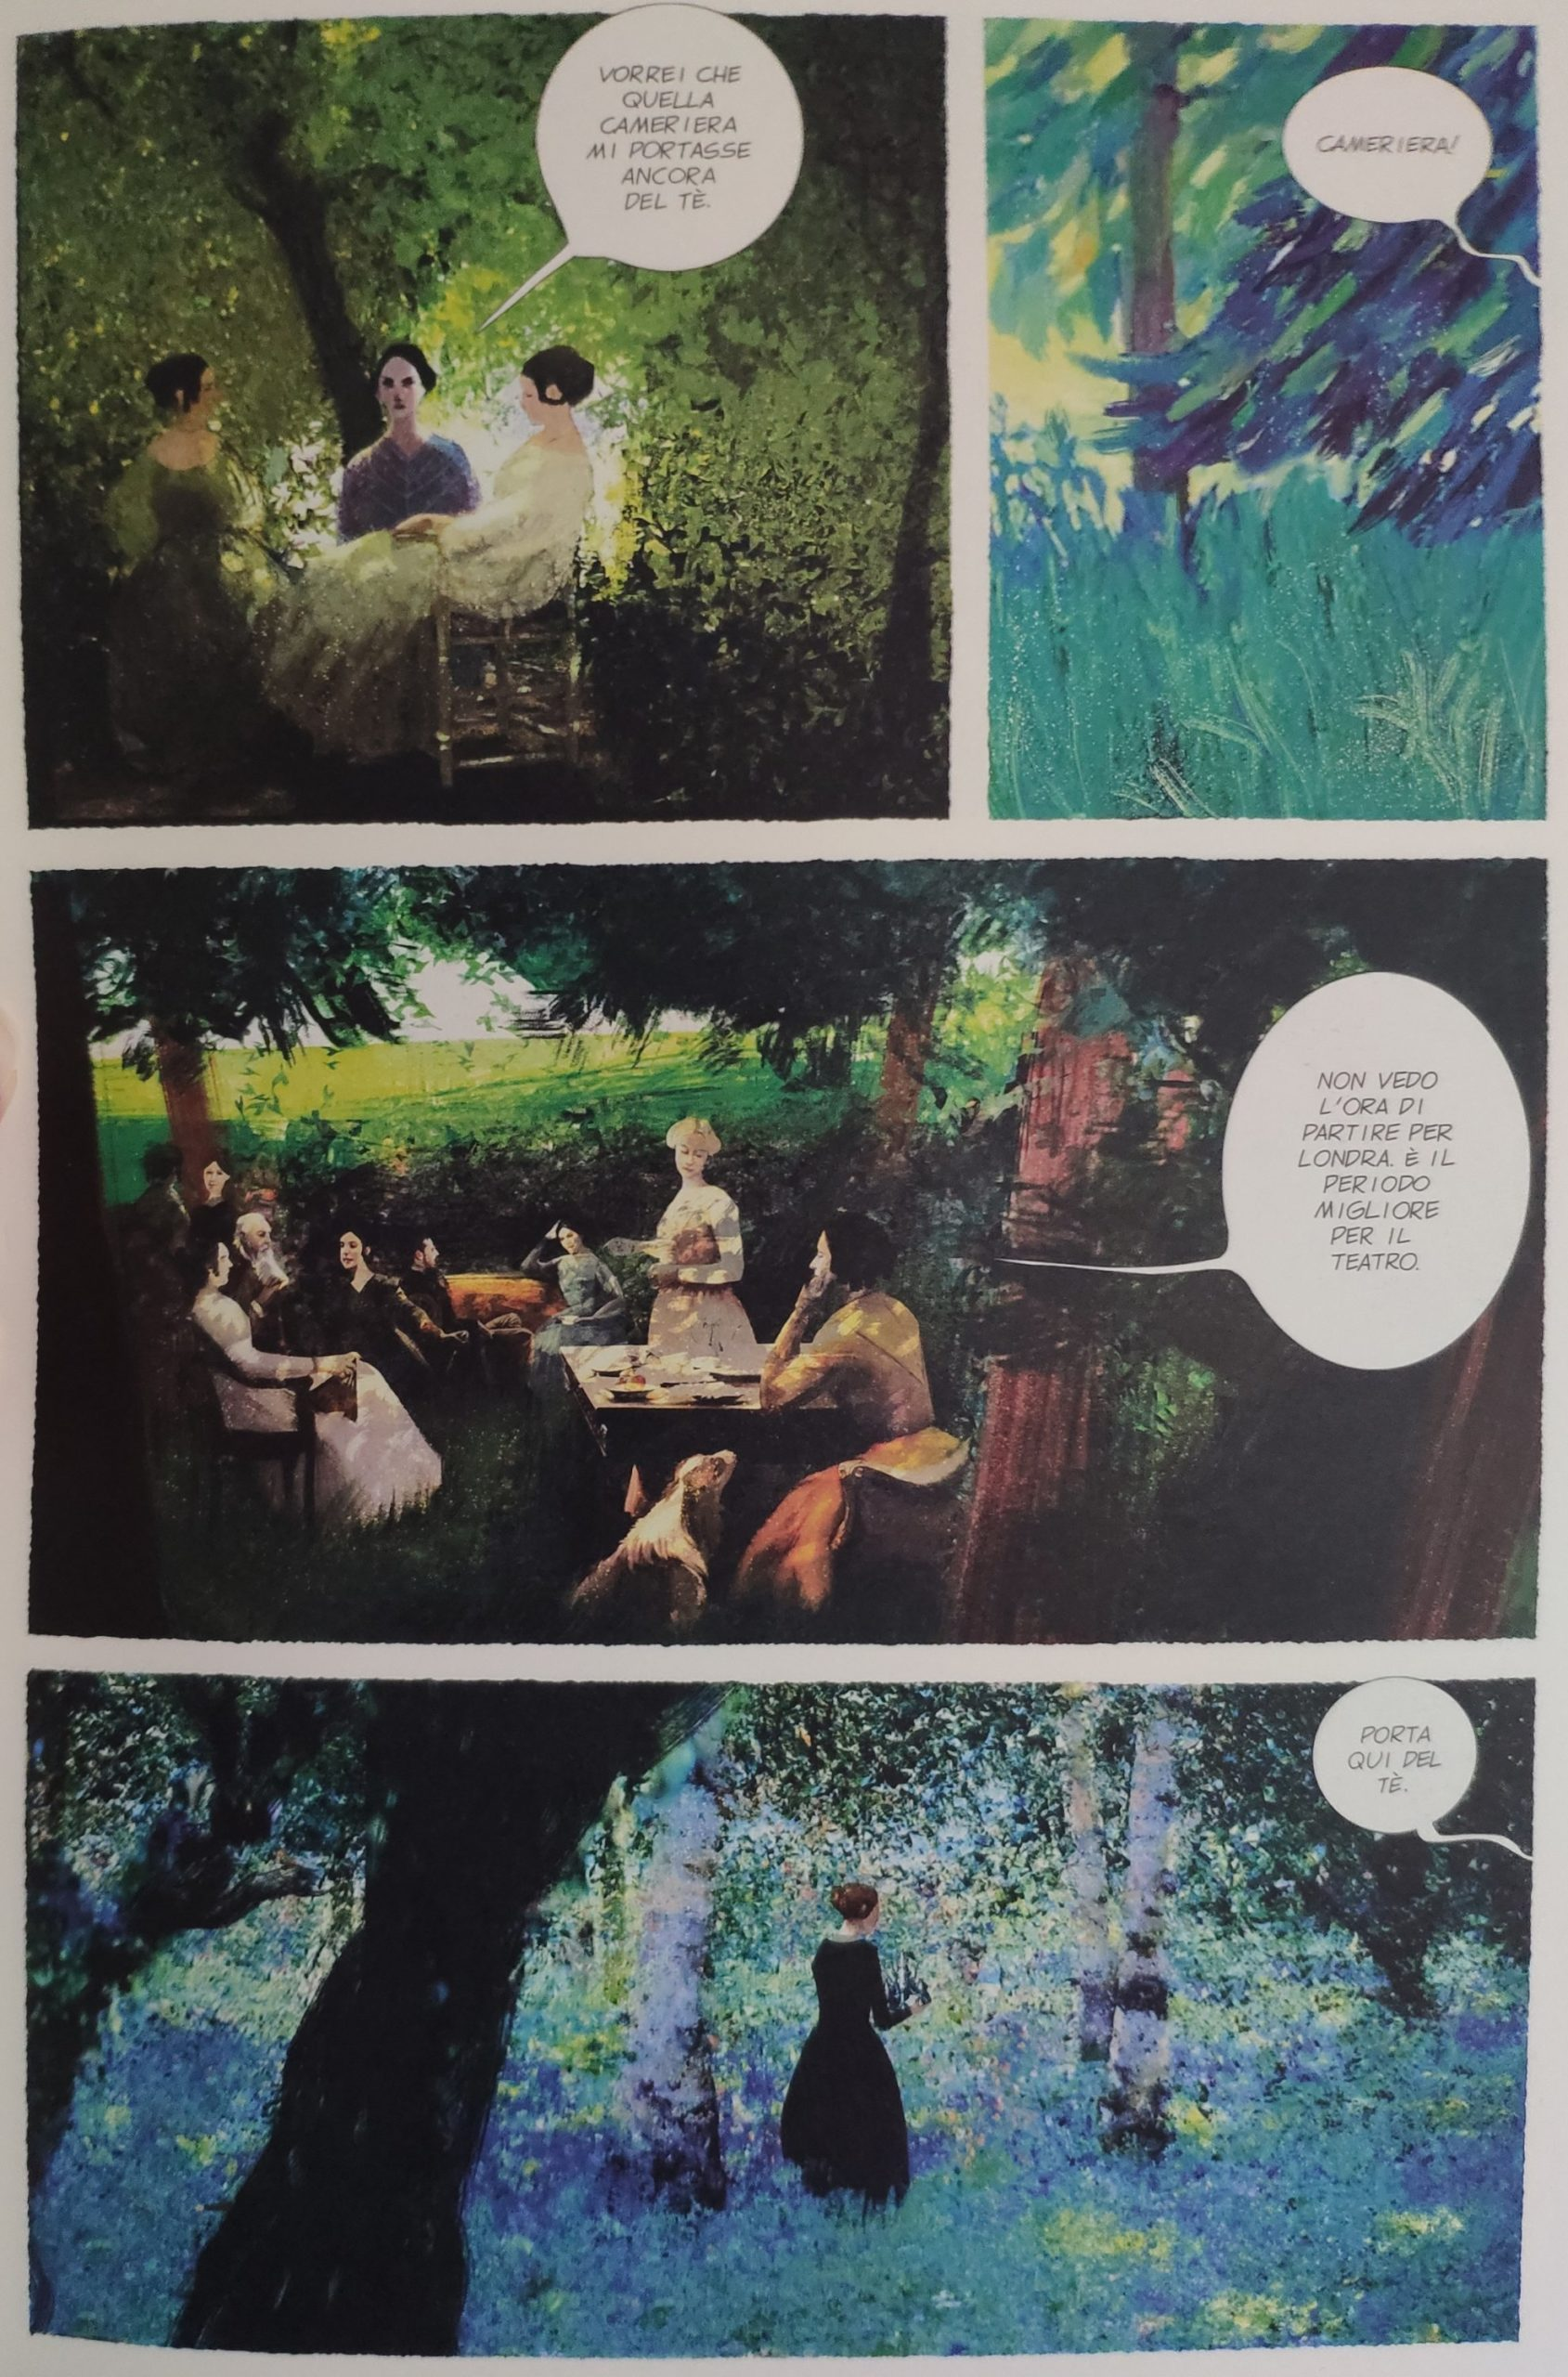 Mio caro fumetto… – Nei giardini di Blenheim Palace